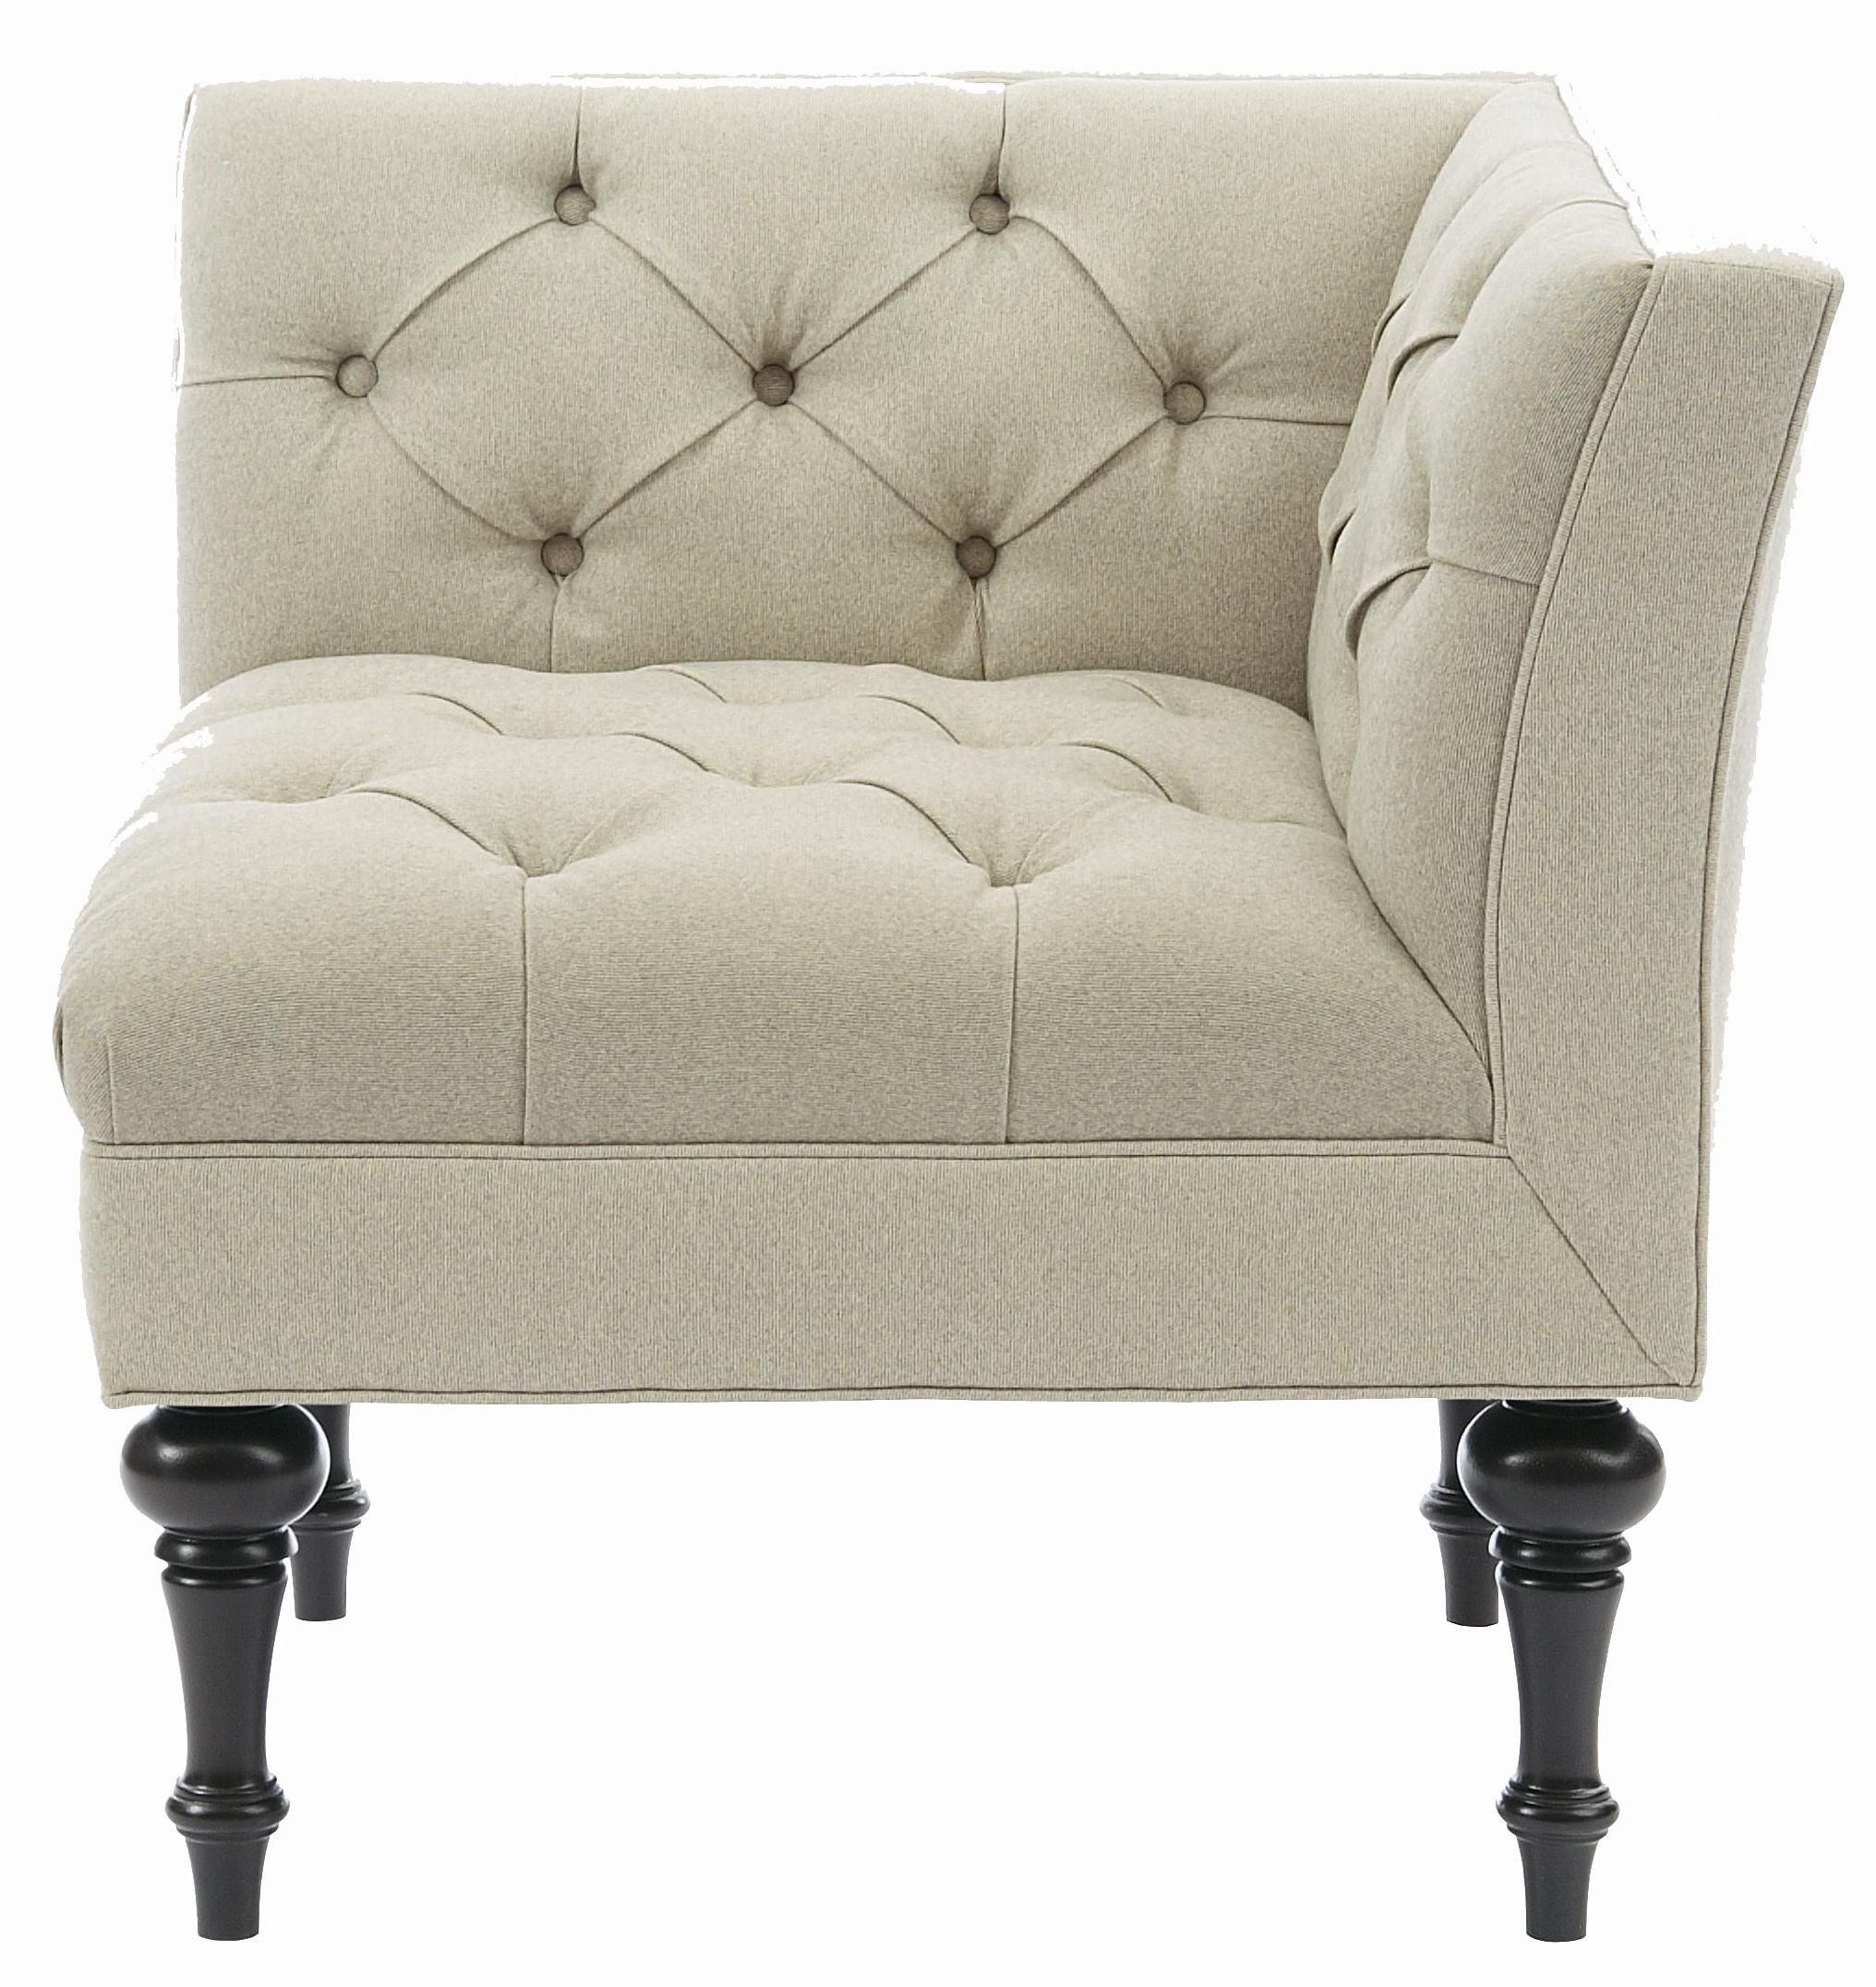 Living Room Furniture Northern Va: Chairs Salon Corner Chair By Bernhardt If It